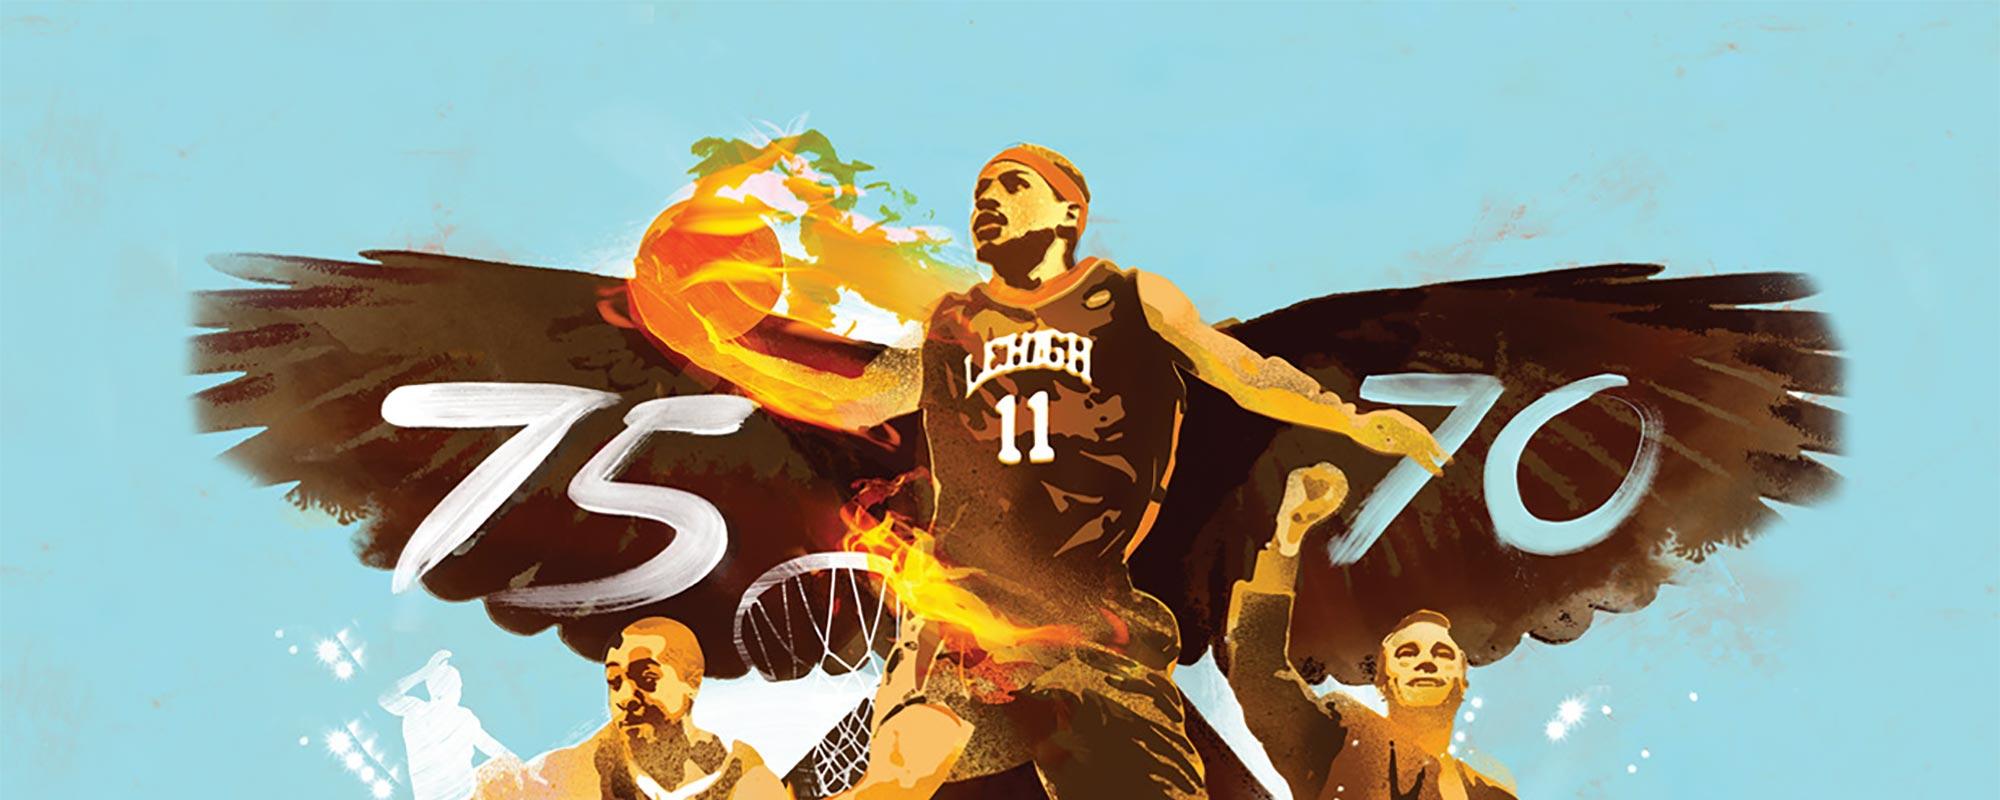 Illustration of Lehigh Basketball team